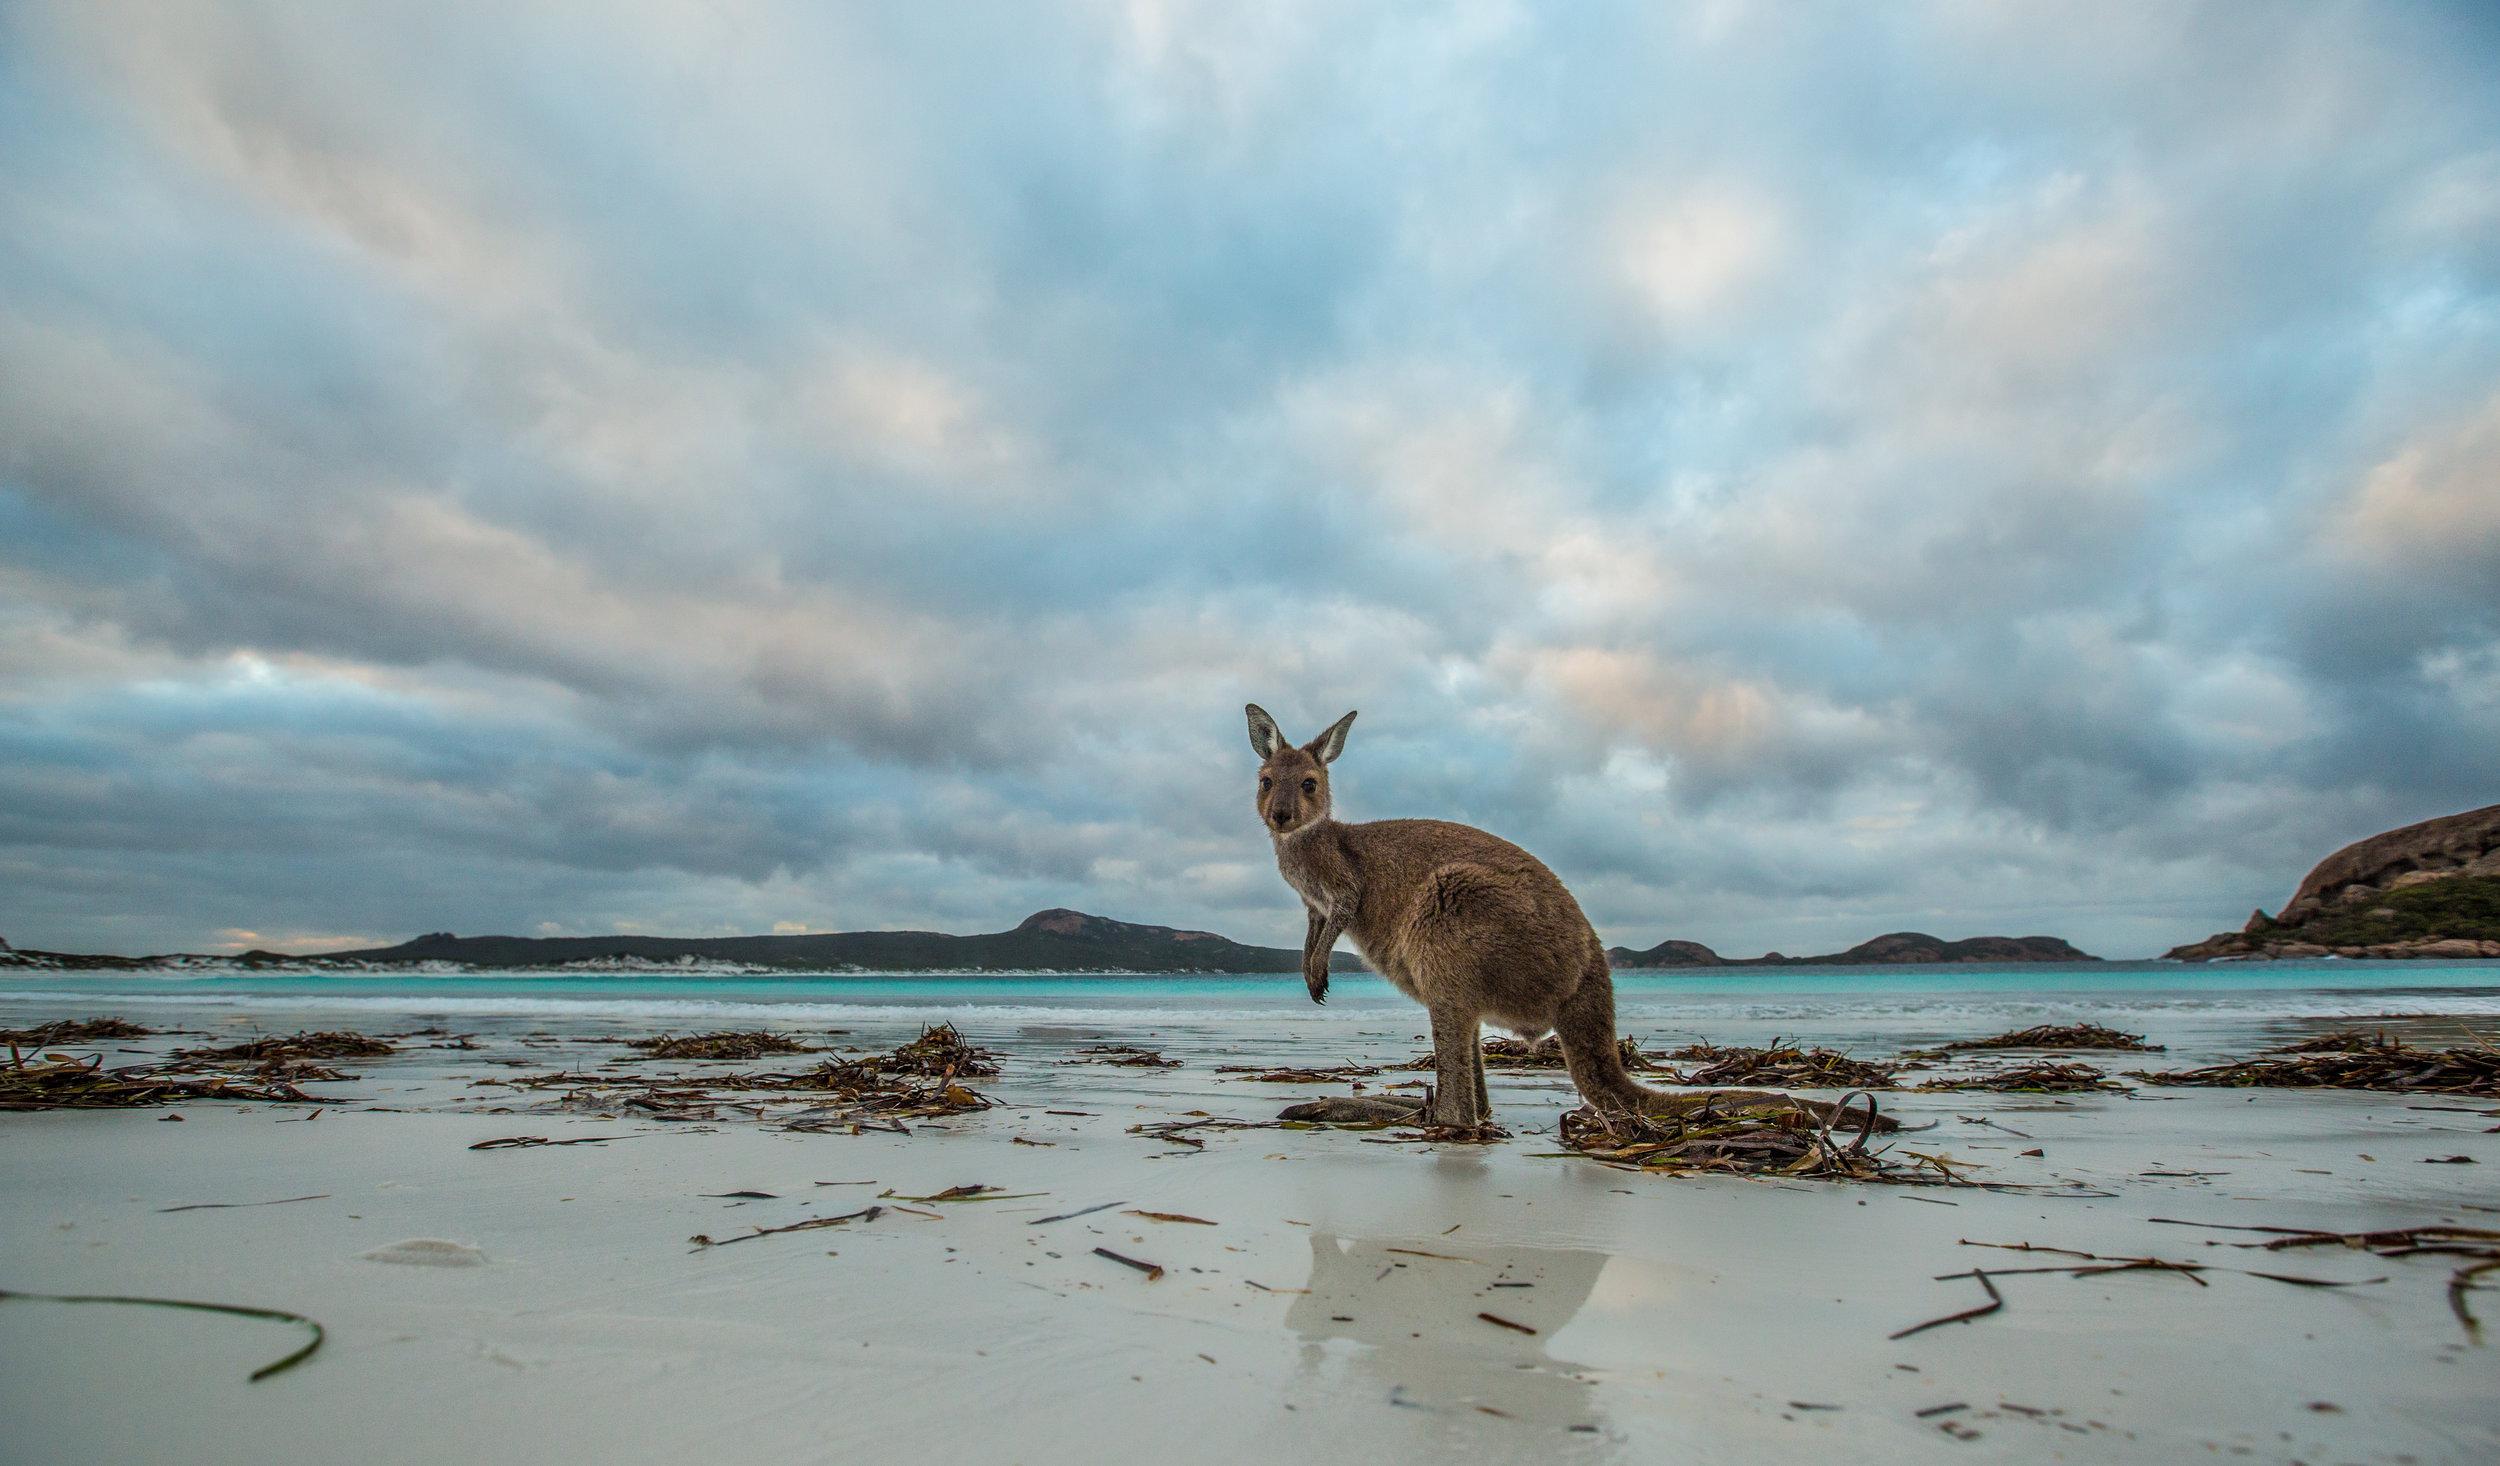 Kangaroo on Lucky Bay, background Recherche Archipelago ©Greg Snell.jpg